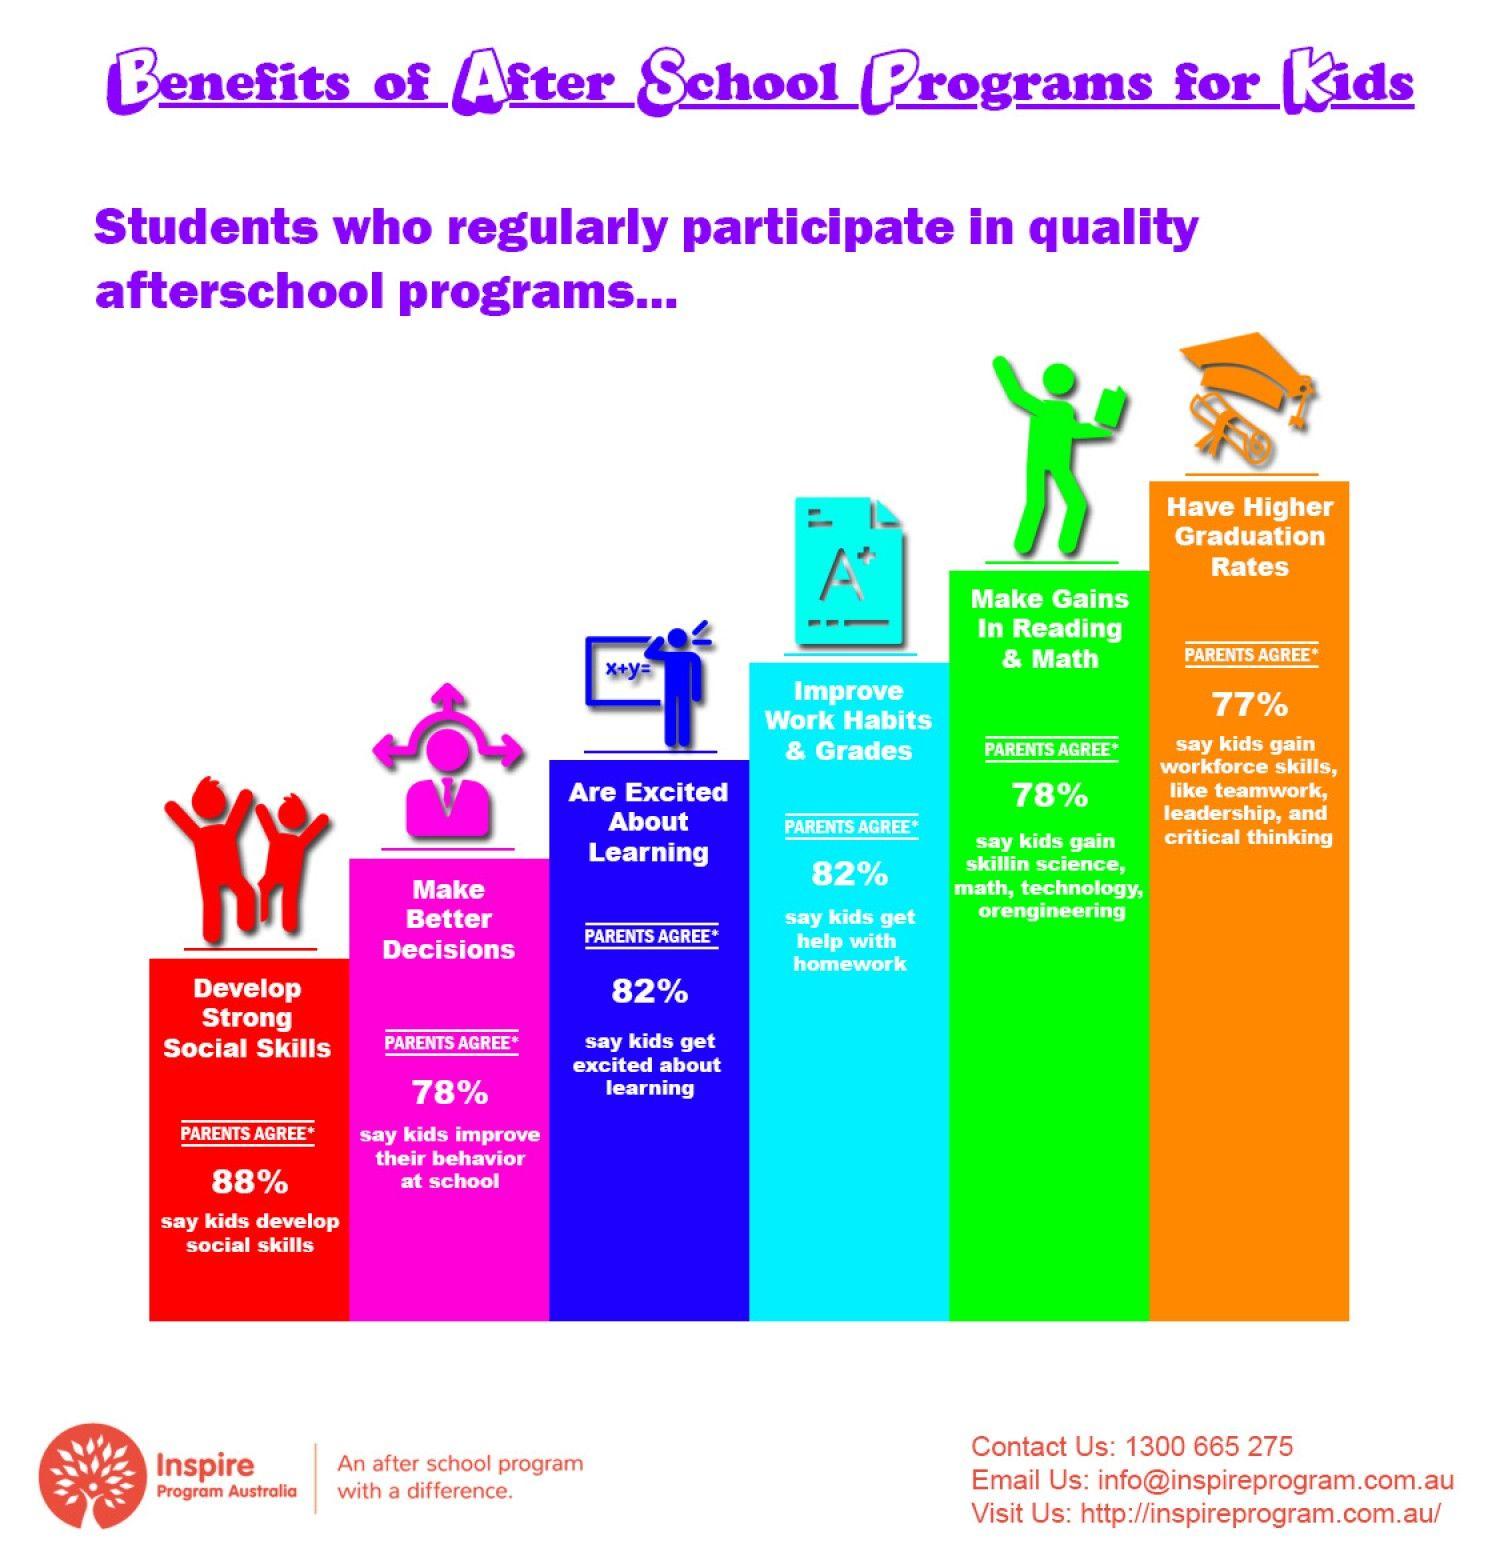 benefits of after school programs for kids inspire program benefits of after school programs for kids inspire program